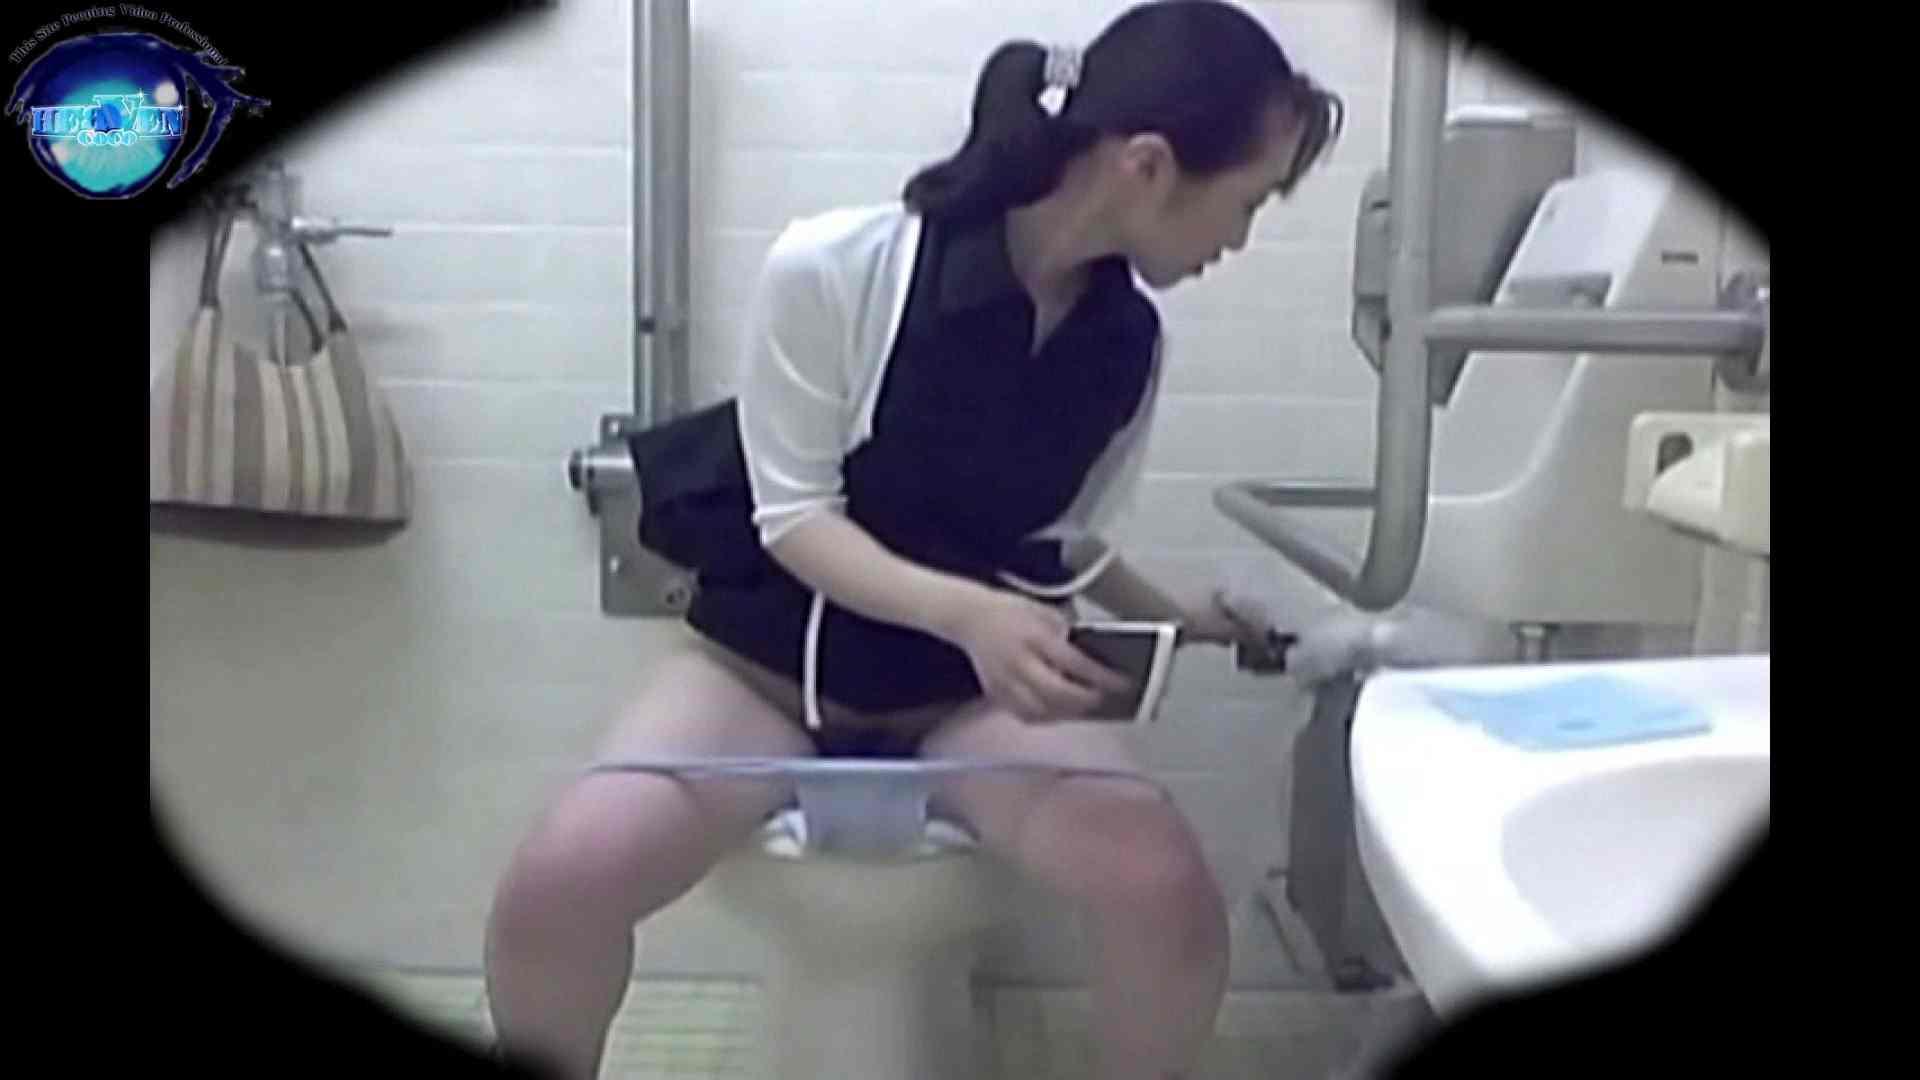 teen galトイレ覗き紙がナイ編‼vol.14 浴衣 オマンコ動画キャプチャ 77PIX 53